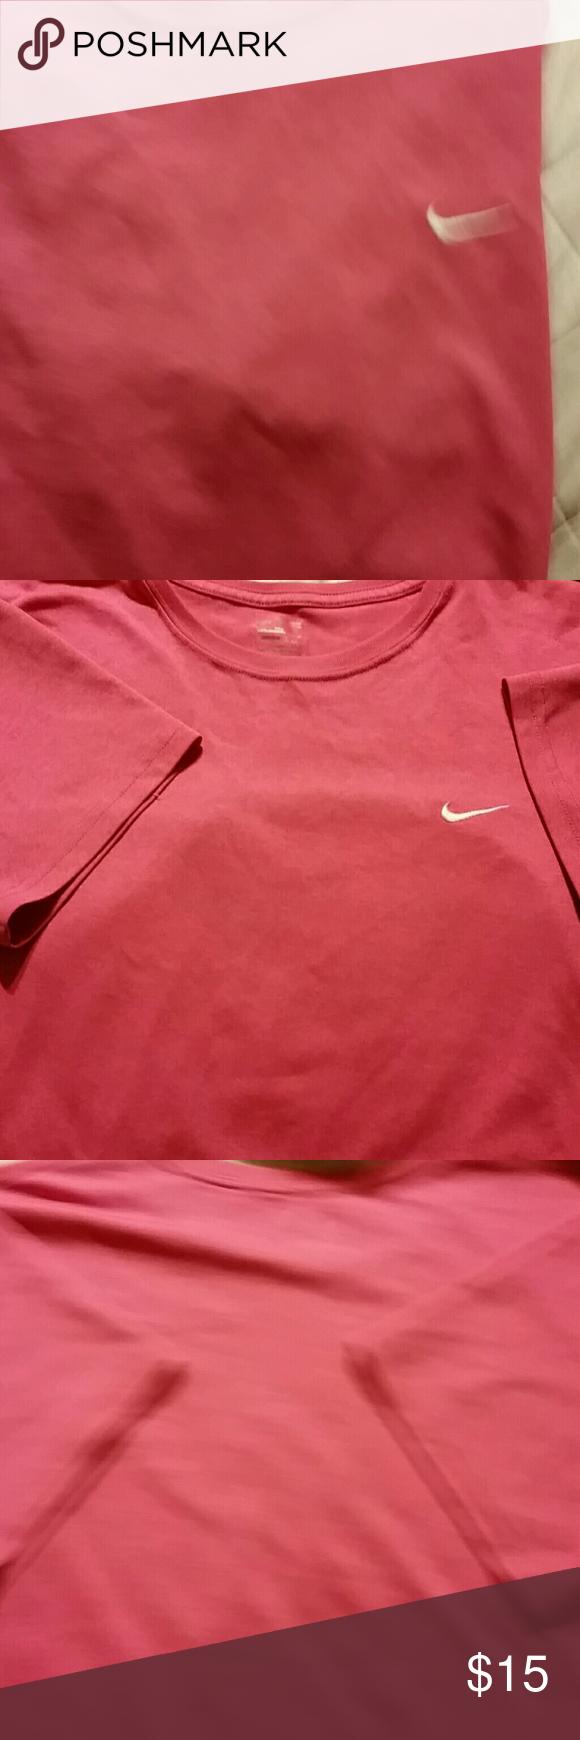 Women's Nike short sleeve shirt Pink great condition Nike short sleeve shirt Nike Tops Tees - Short Sleeve